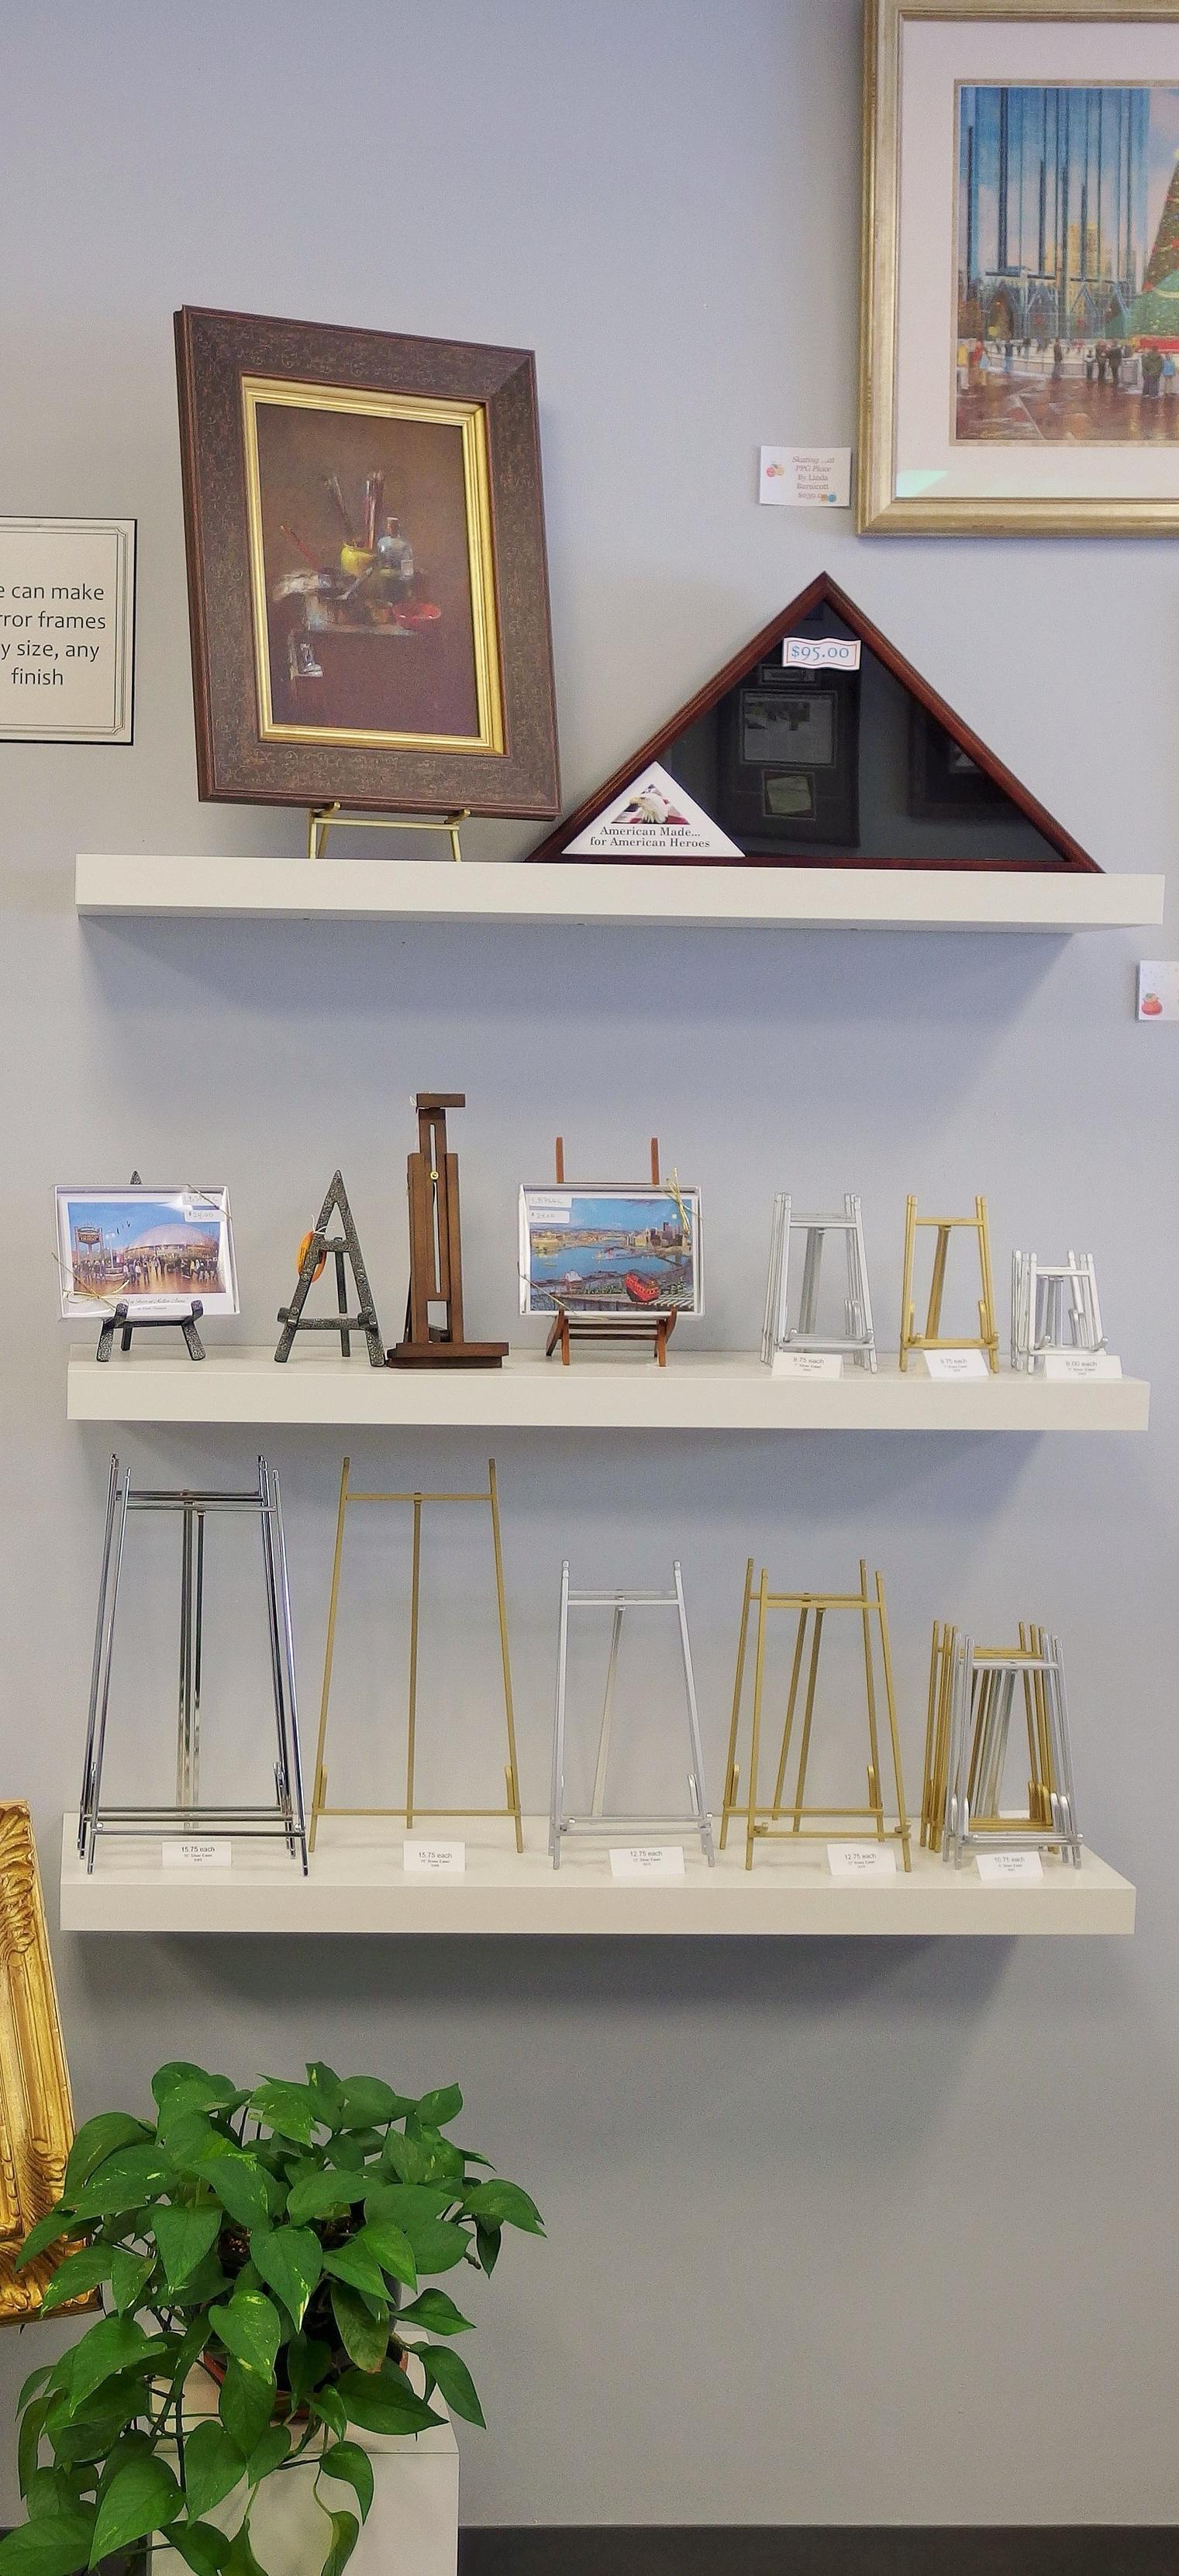 Lois Guinn Framing products